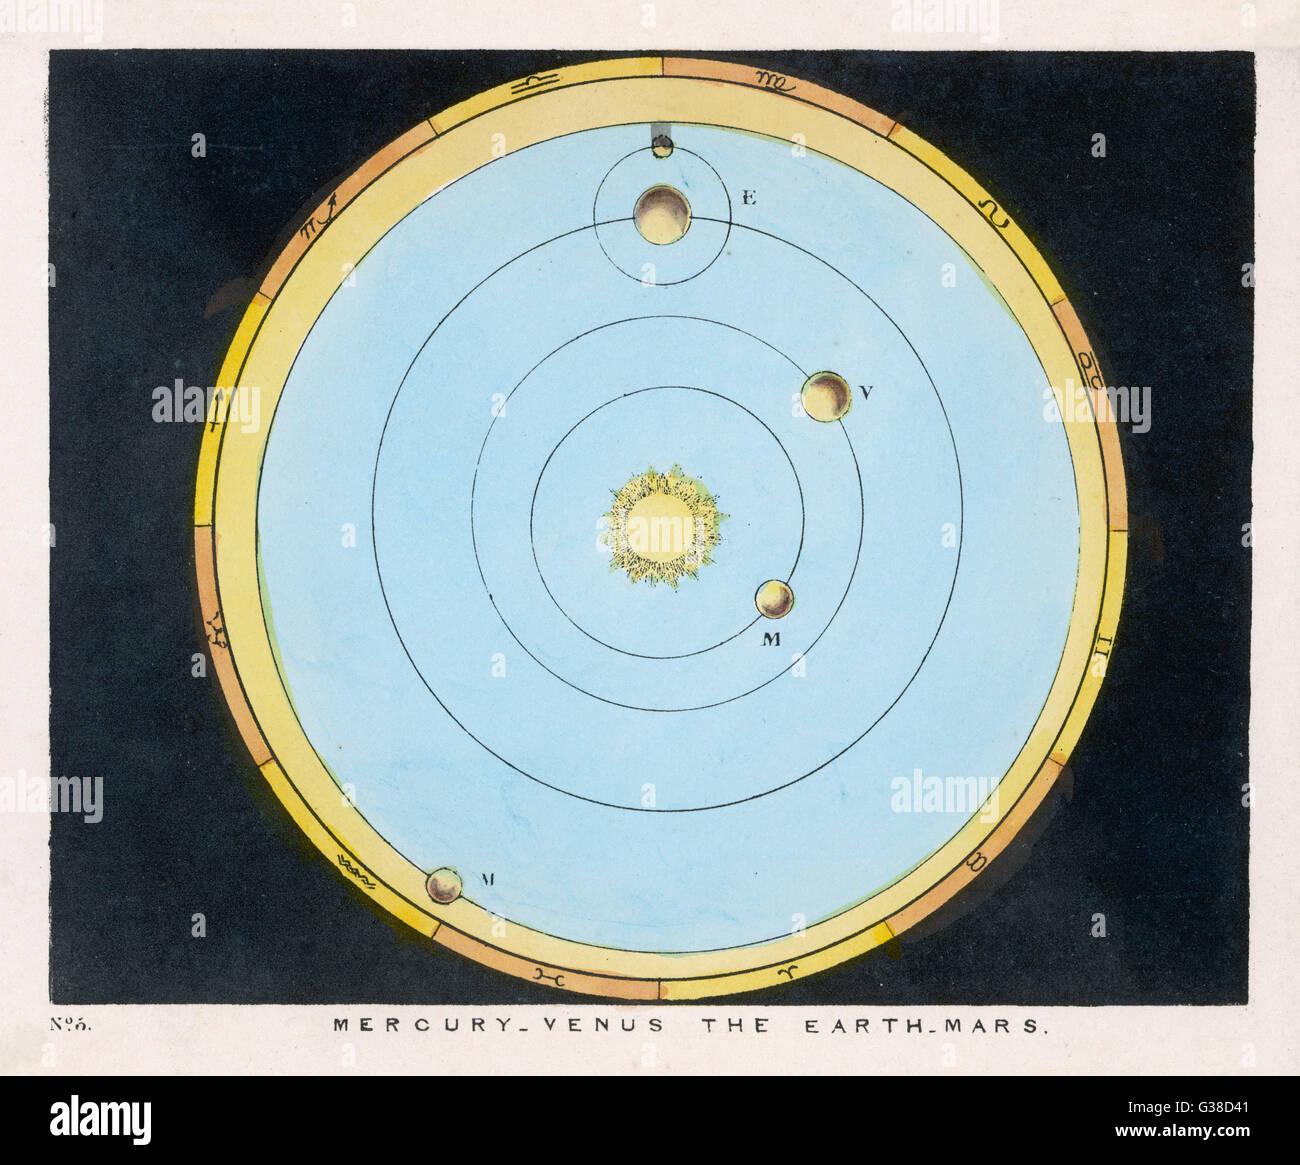 hight resolution of a diagram showing mercury venus earth amp mars date 1849